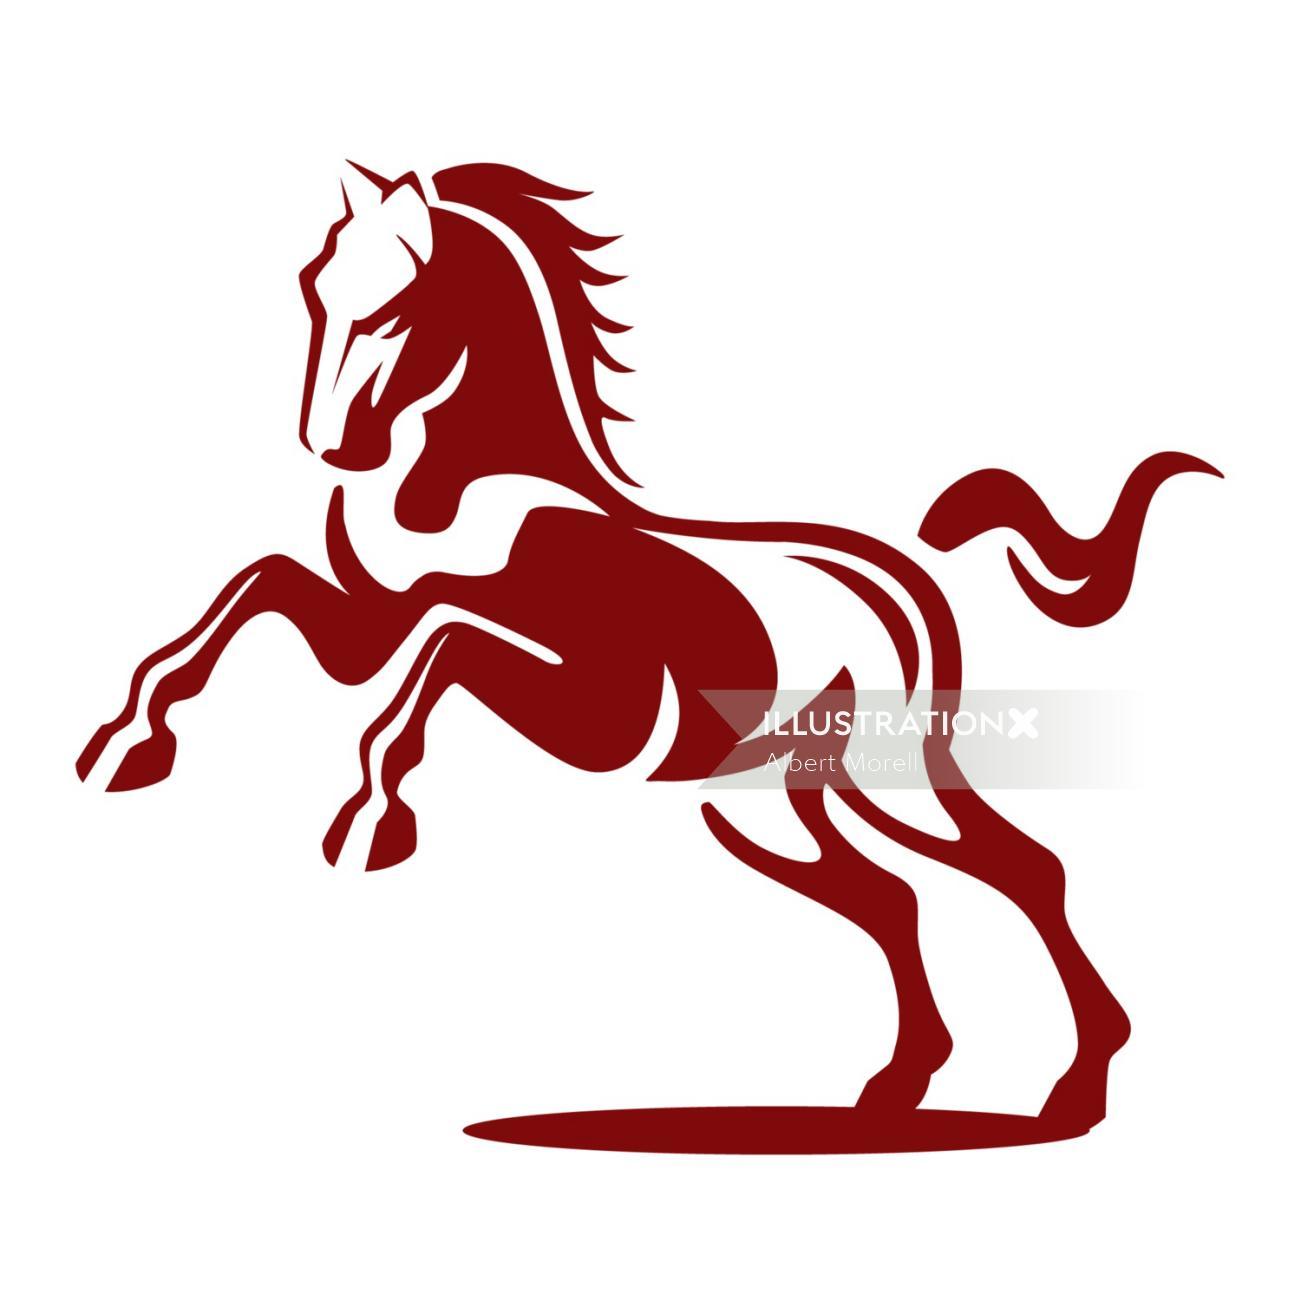 Logo Illustration of Horse